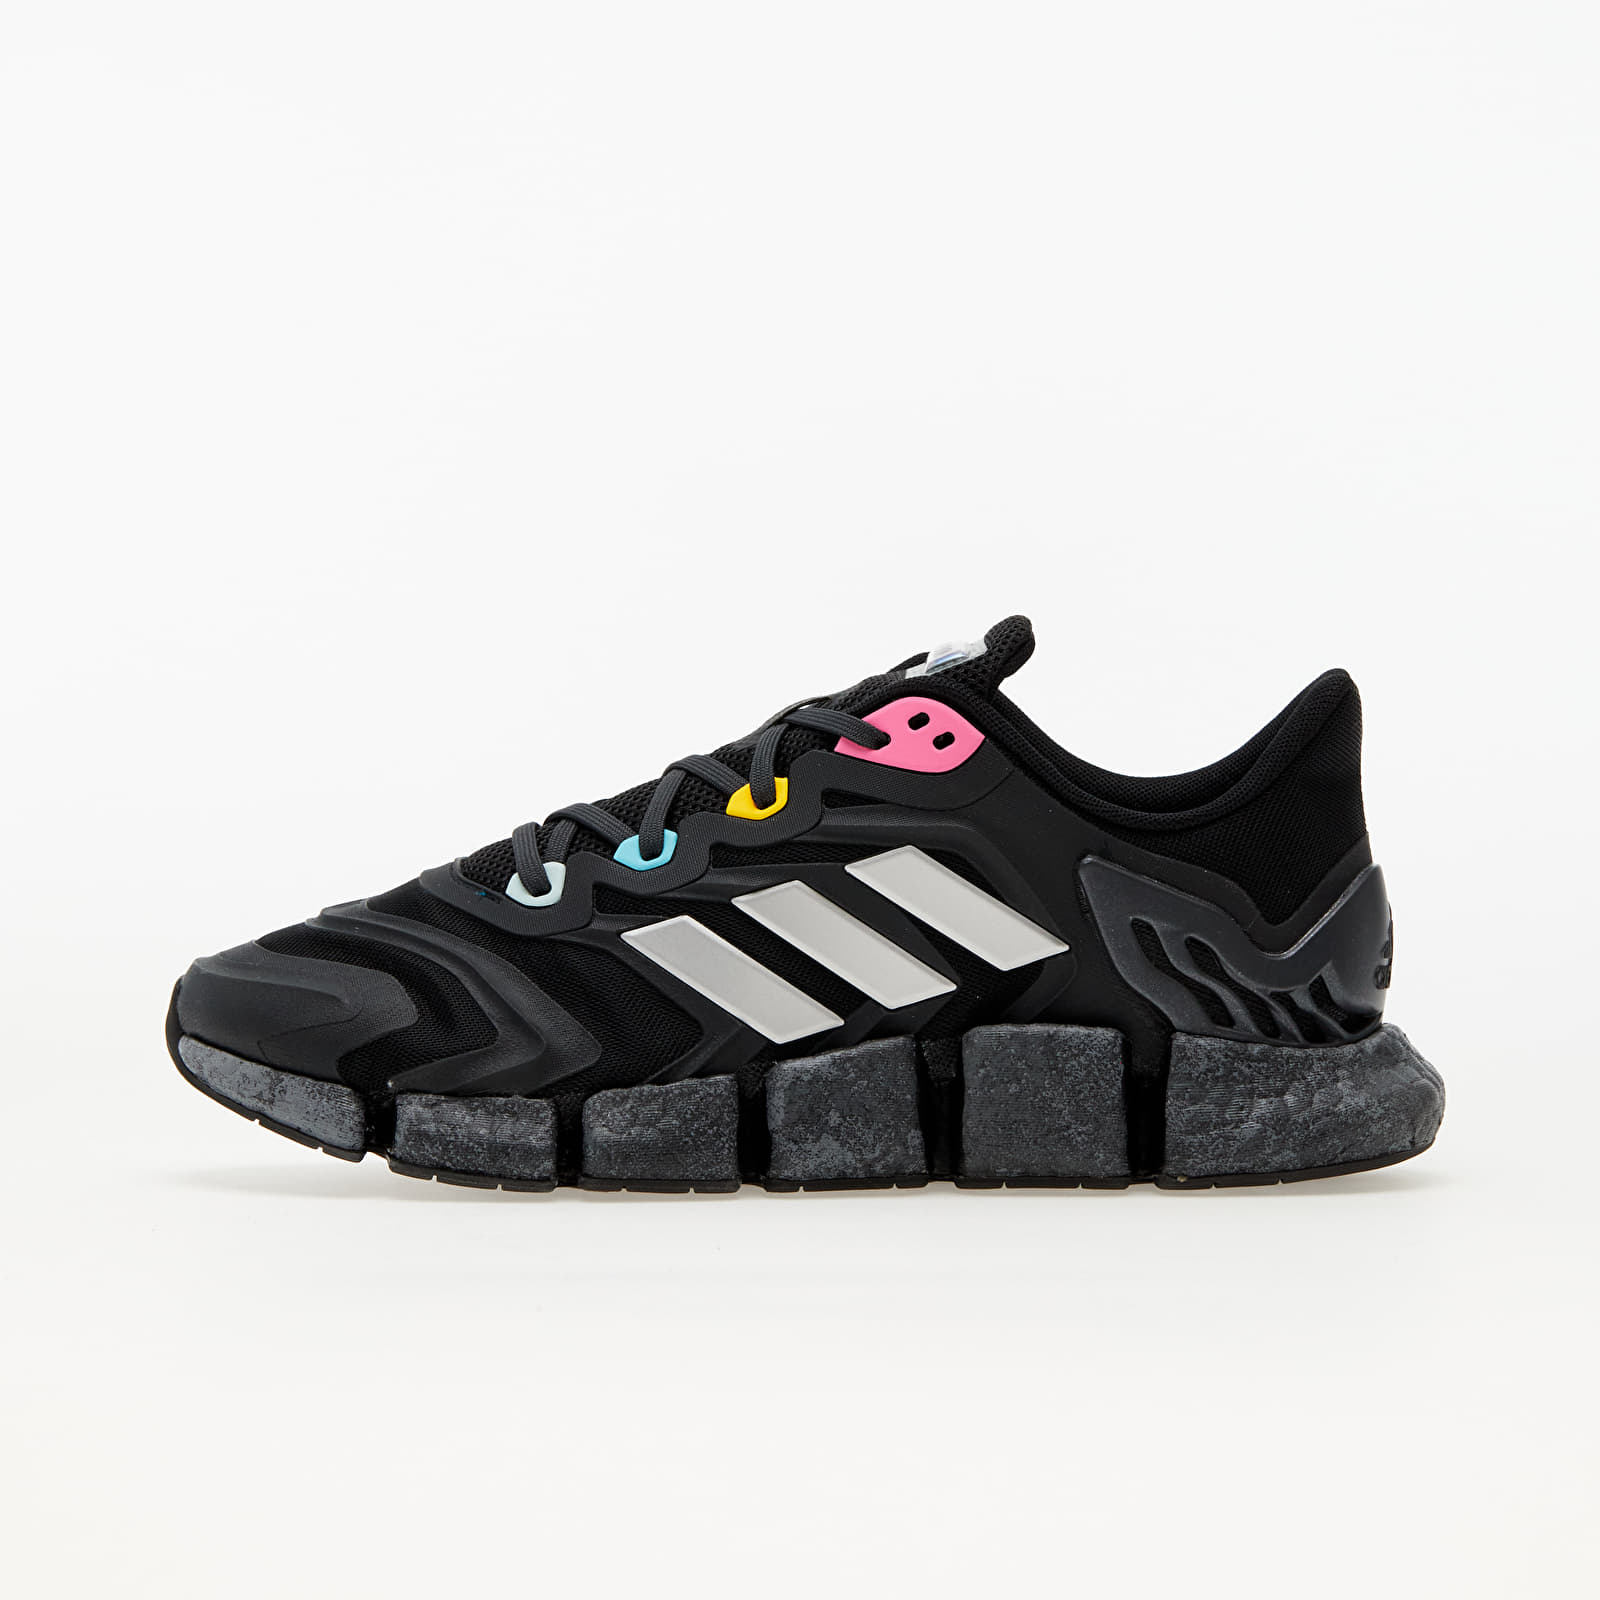 adidas Climacool Vento Core Black/ Mate Silver/ Carbon EUR 47 1/3